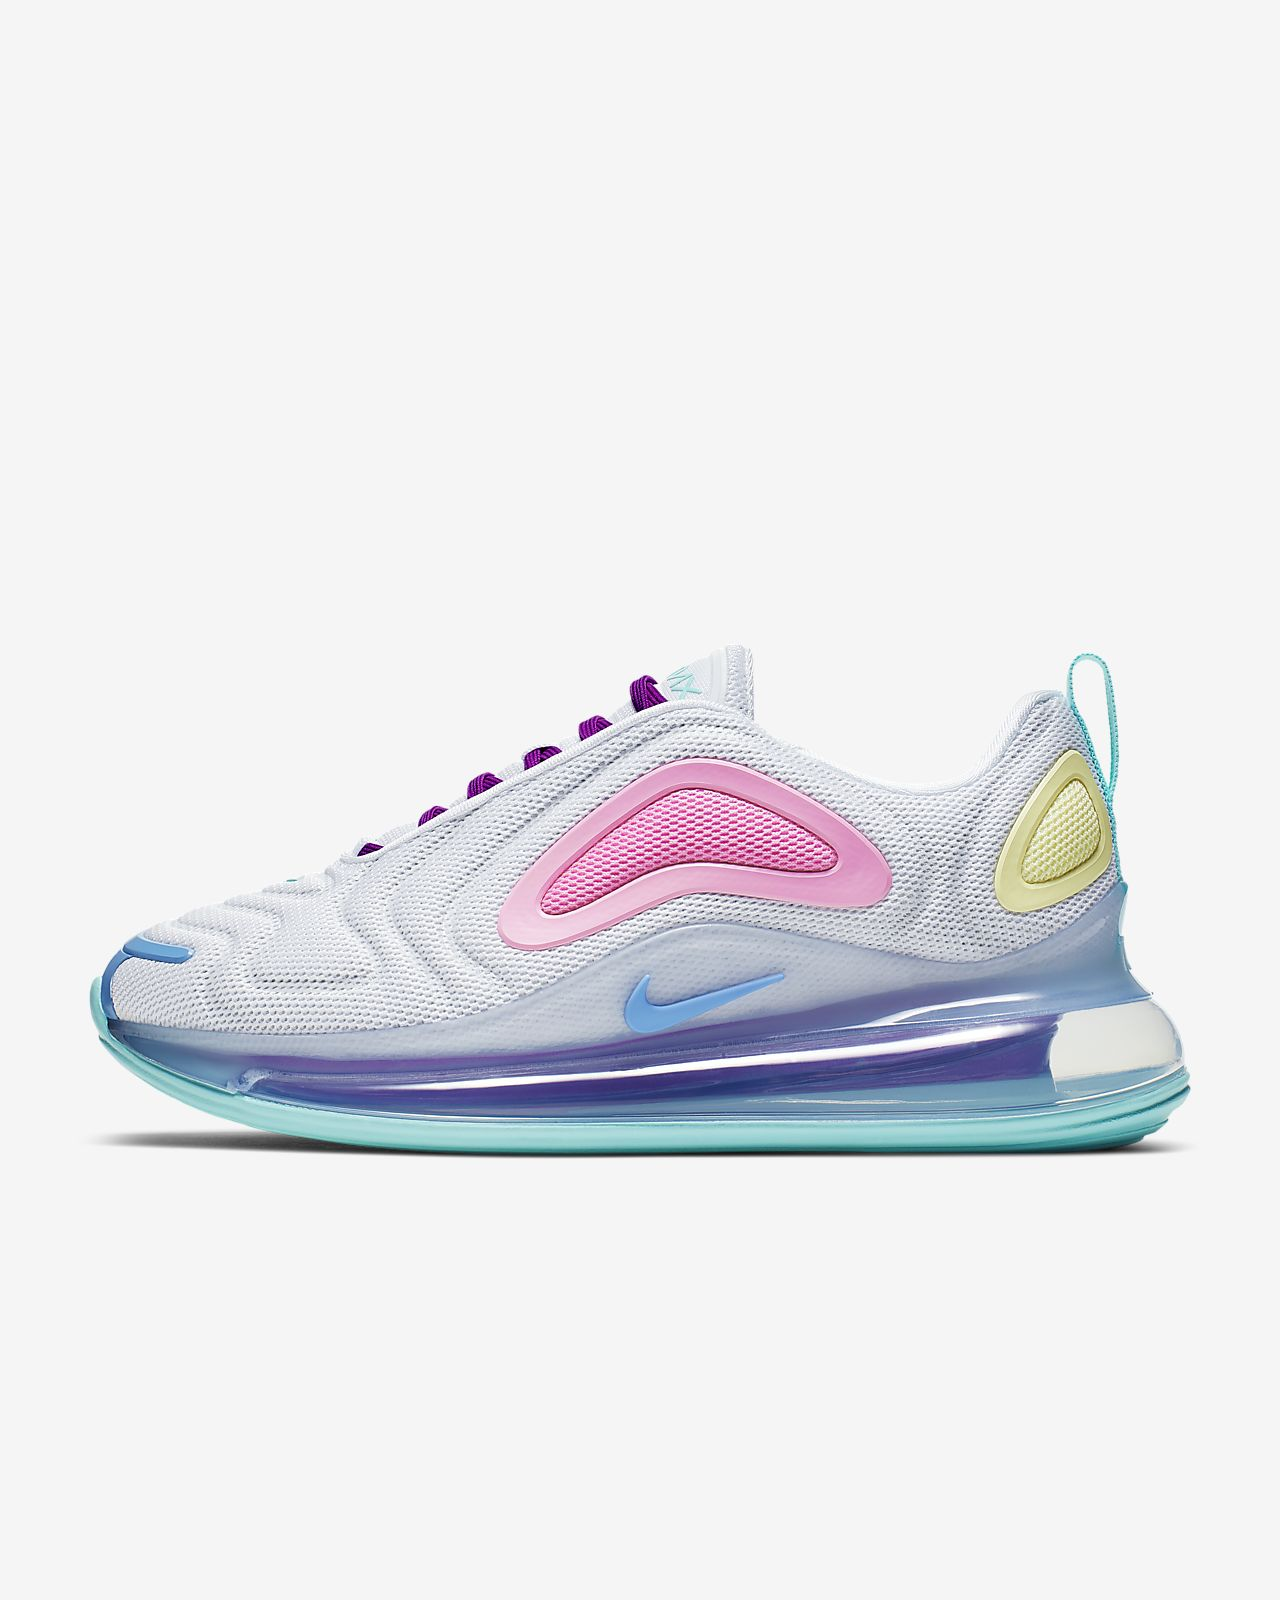 70f03d4eaafdc4 Nike Air Max 720 Women's Shoe. Nike.com